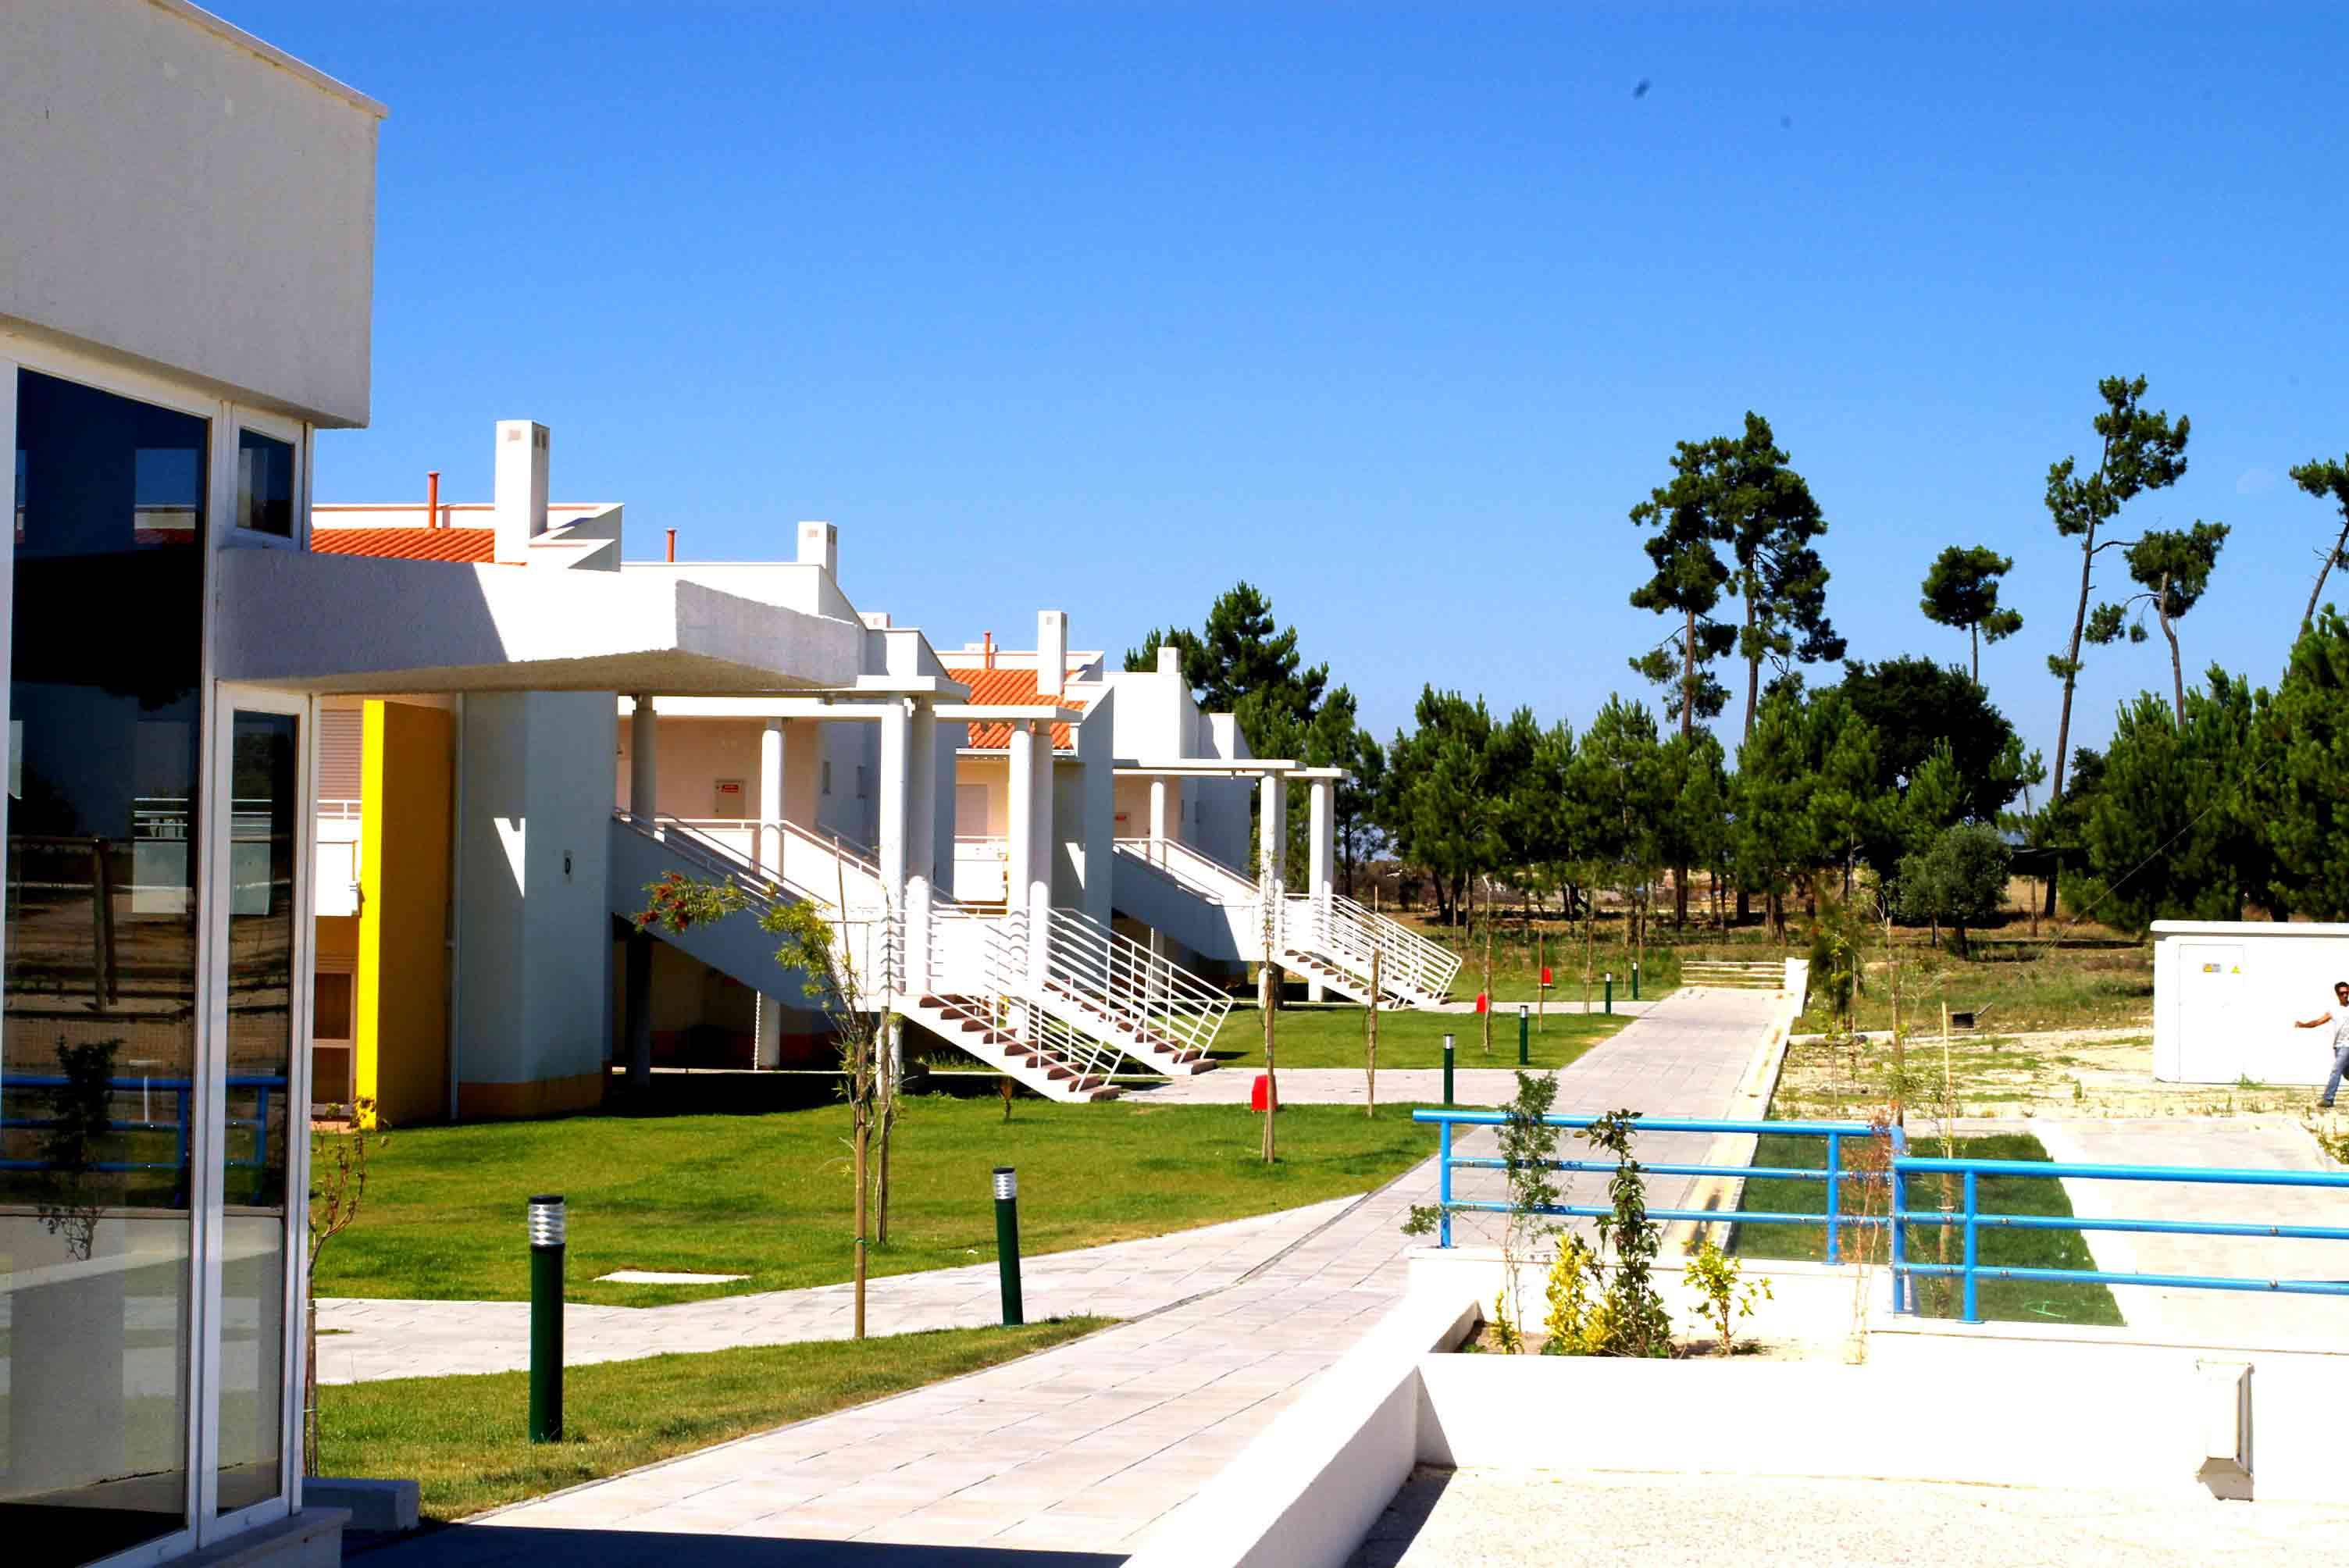 Aldeamento Turístico de Palmela